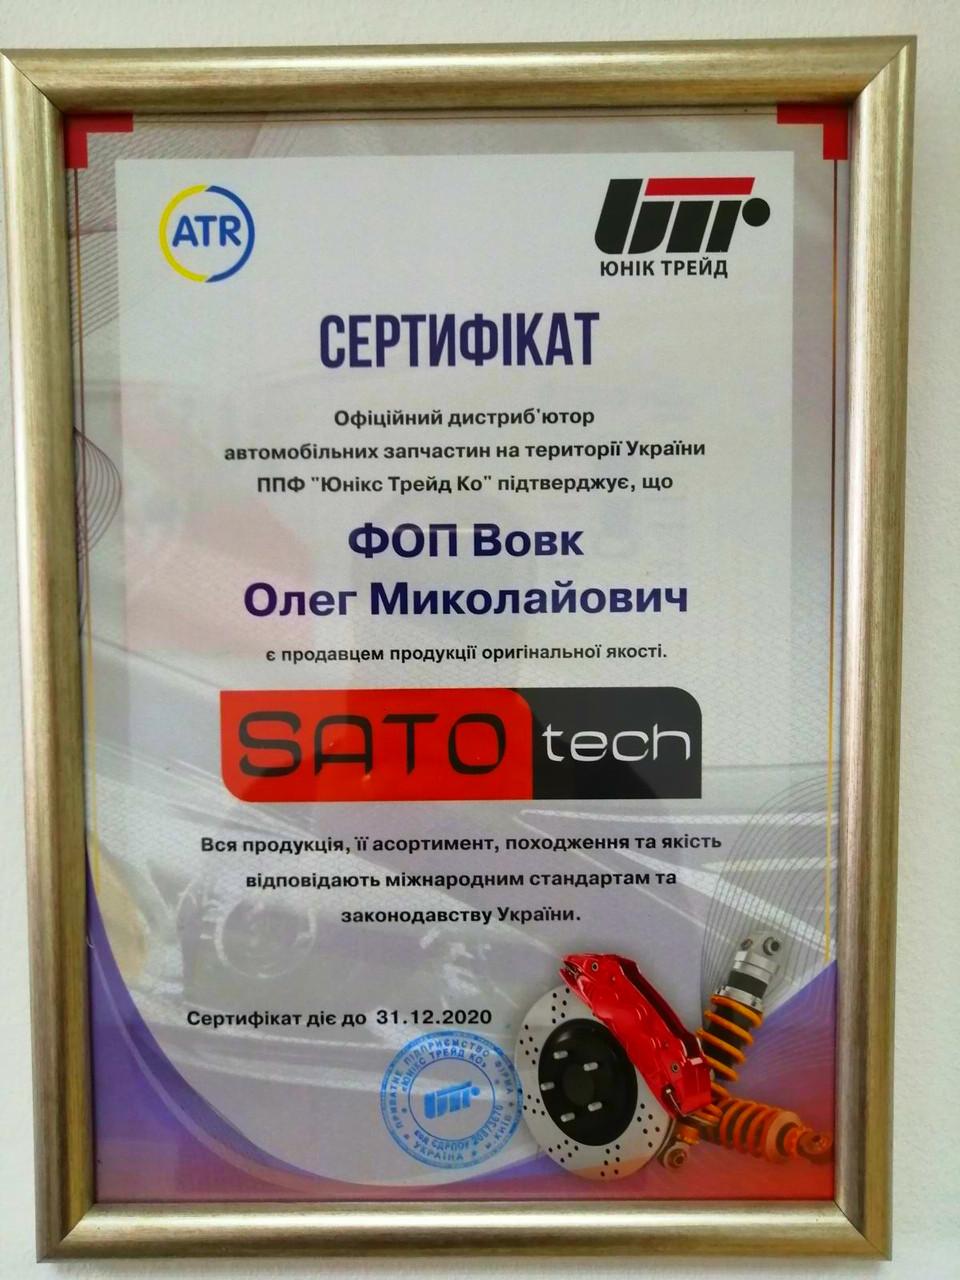 SATO Амортизатор BMW 5 Series (E34) 88-